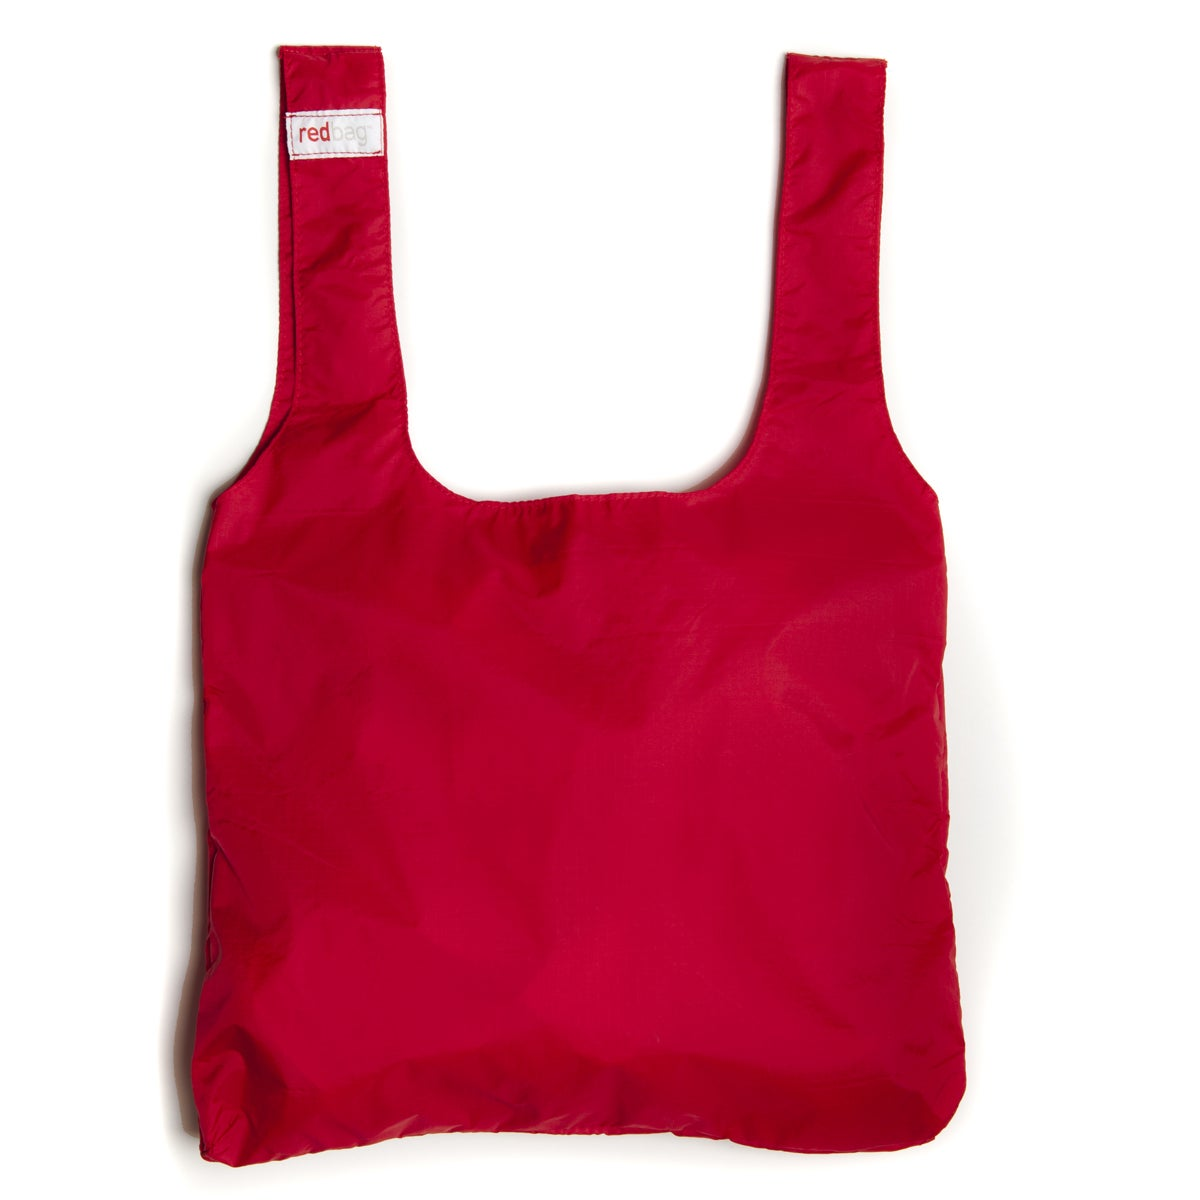 RedBag Tear-Stop Nylon Reusable Tote Bag (Pack of 3)